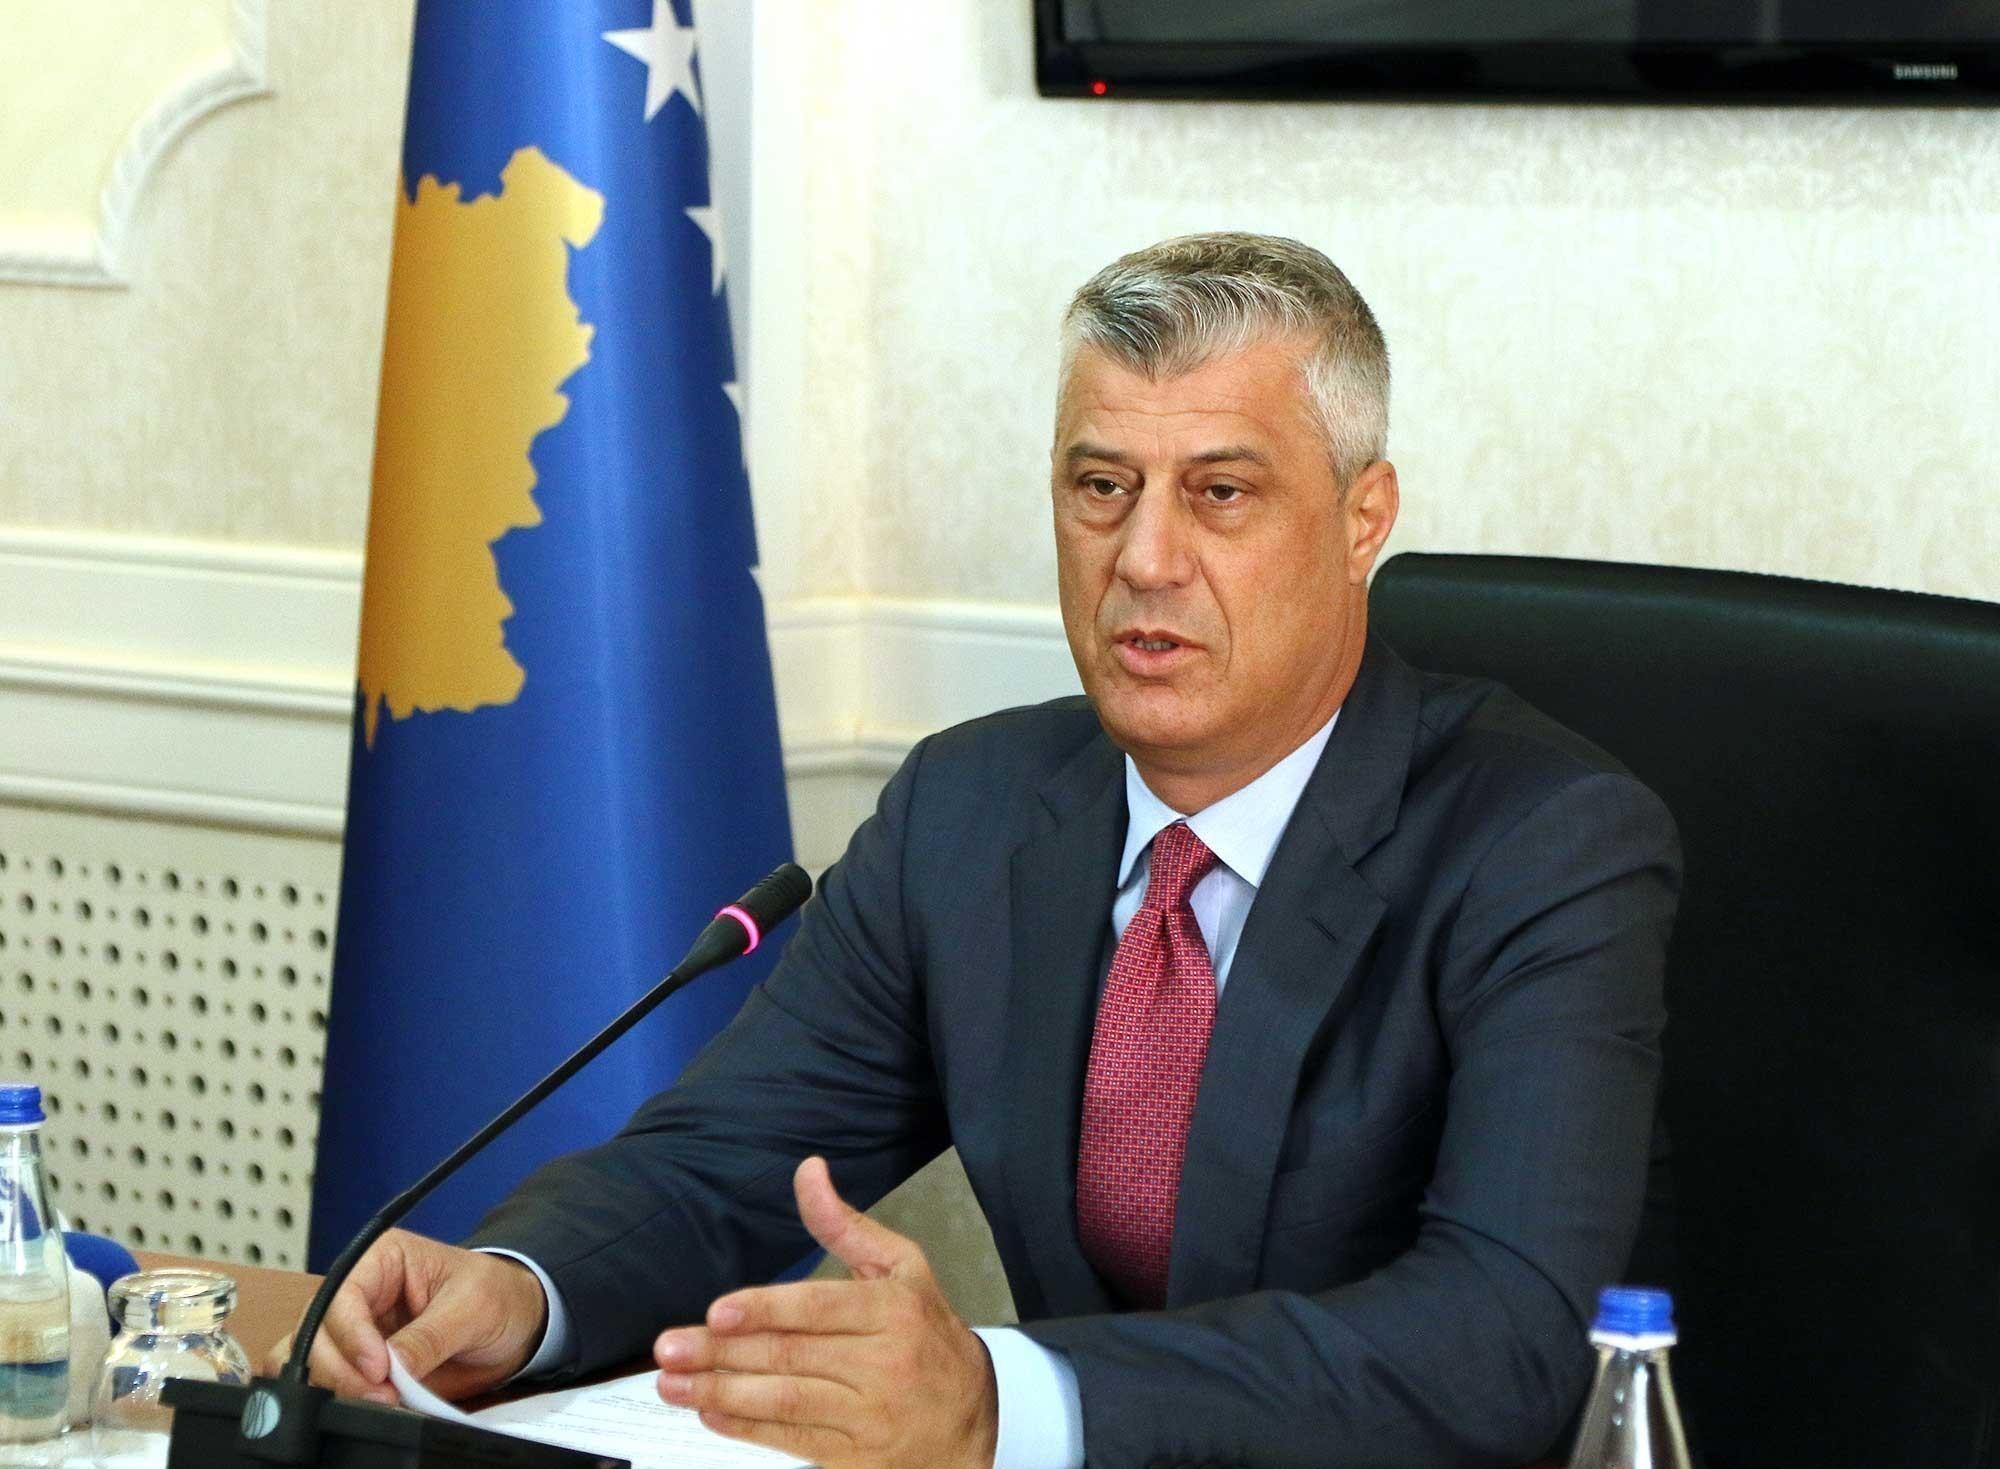 Thaci: Το Κοσσυφοπέδιο χρειάζεται νέα κυβέρνηση